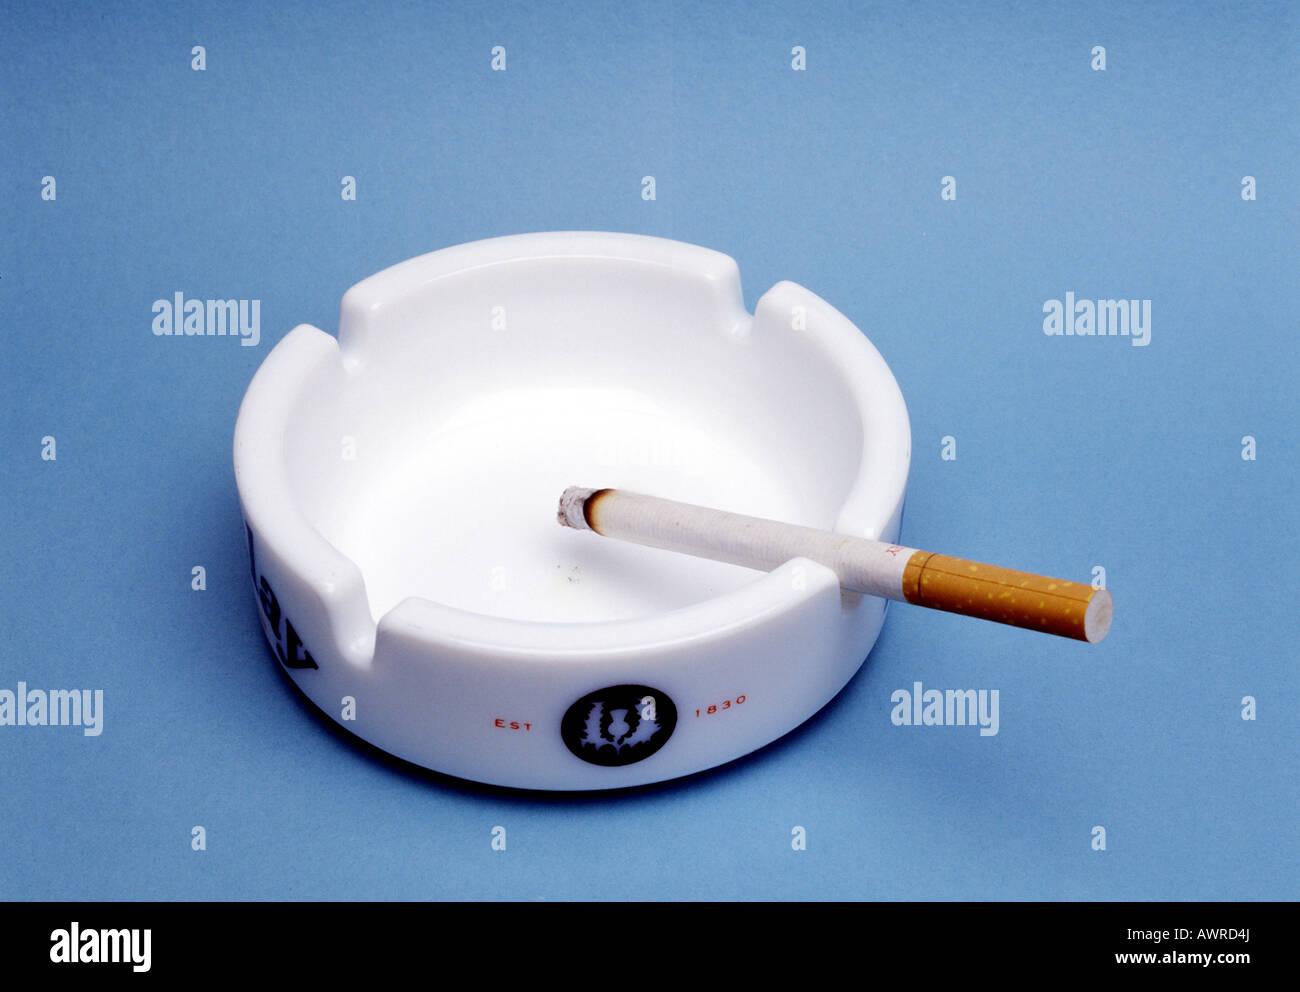 Burning cigarette in ashtray - Stock Image